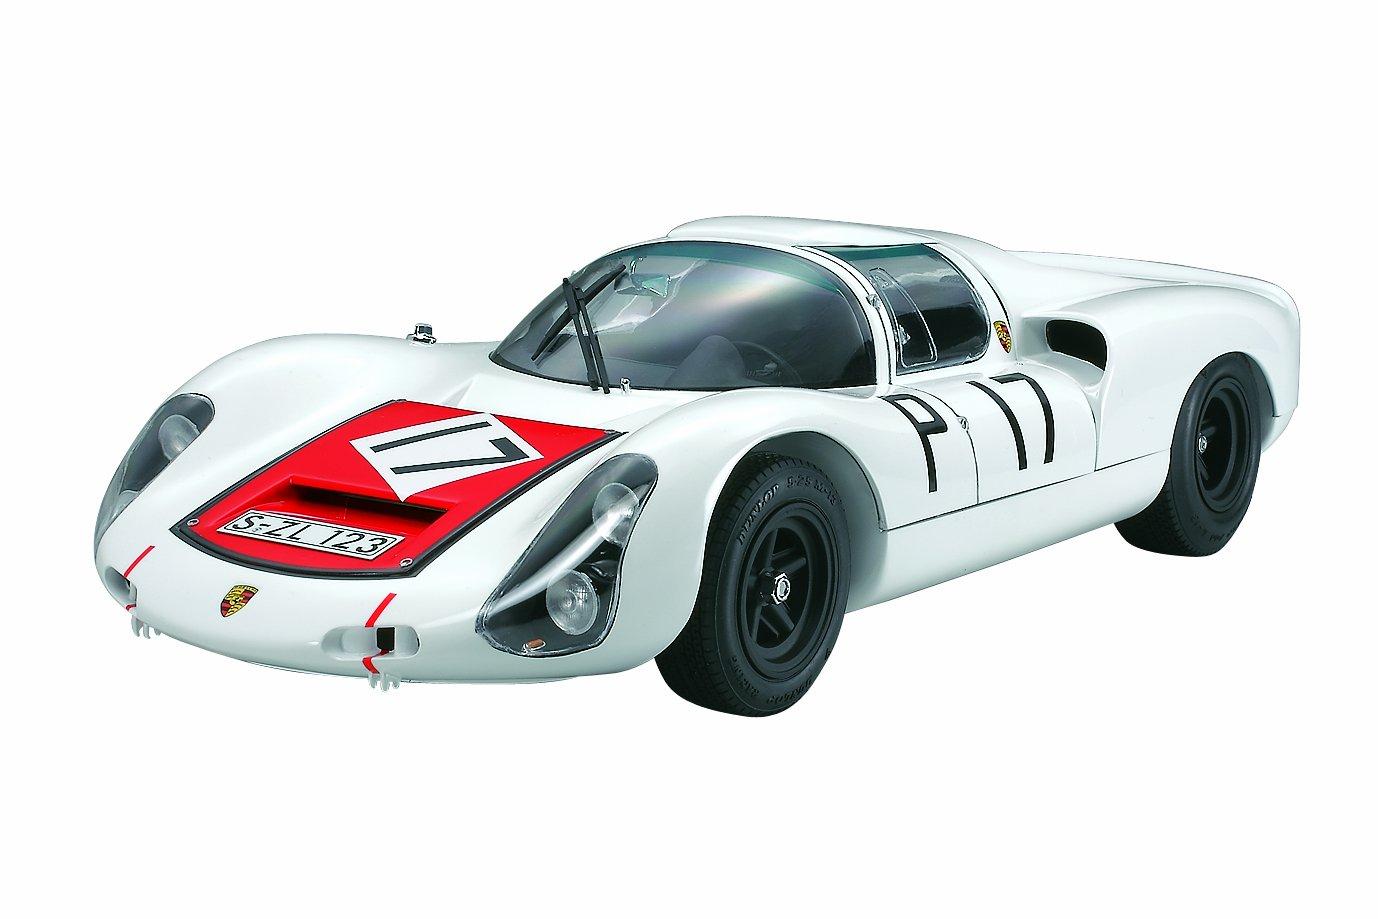 Amazon.com: Tamiya Porsche 910 Vehicle: Toys & Games